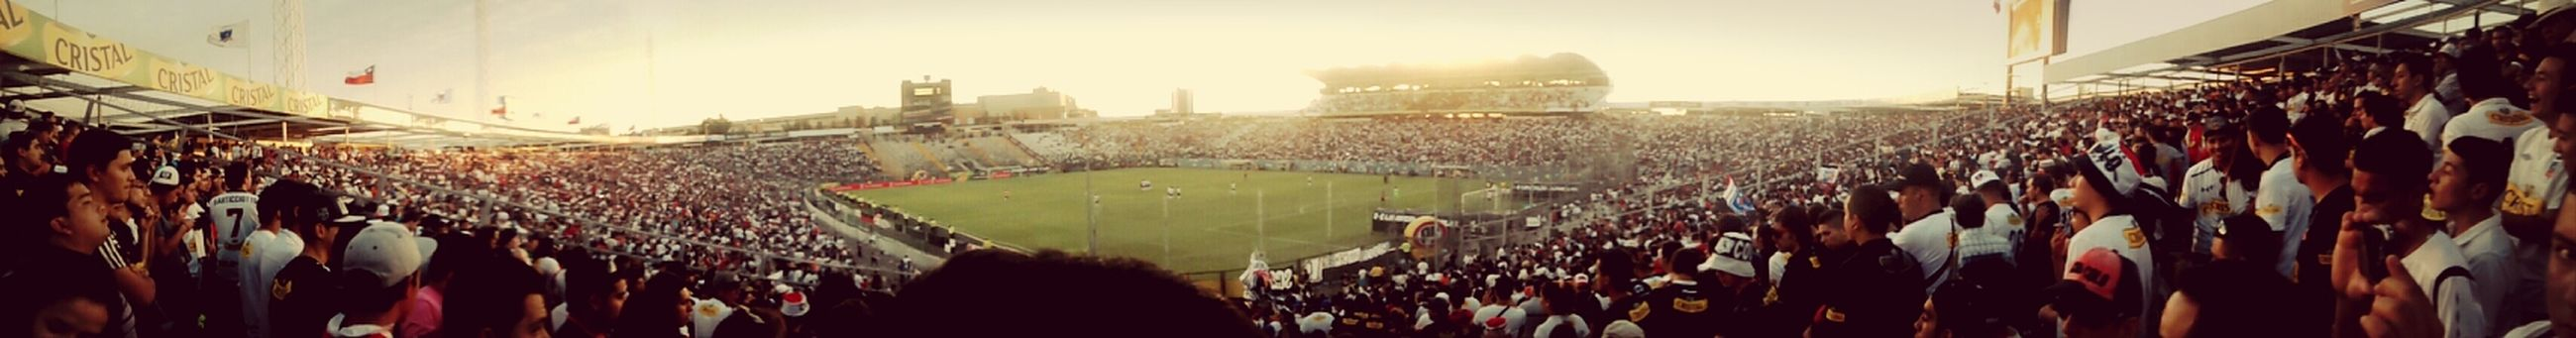 Soccer Football Colo-colo Carnaval